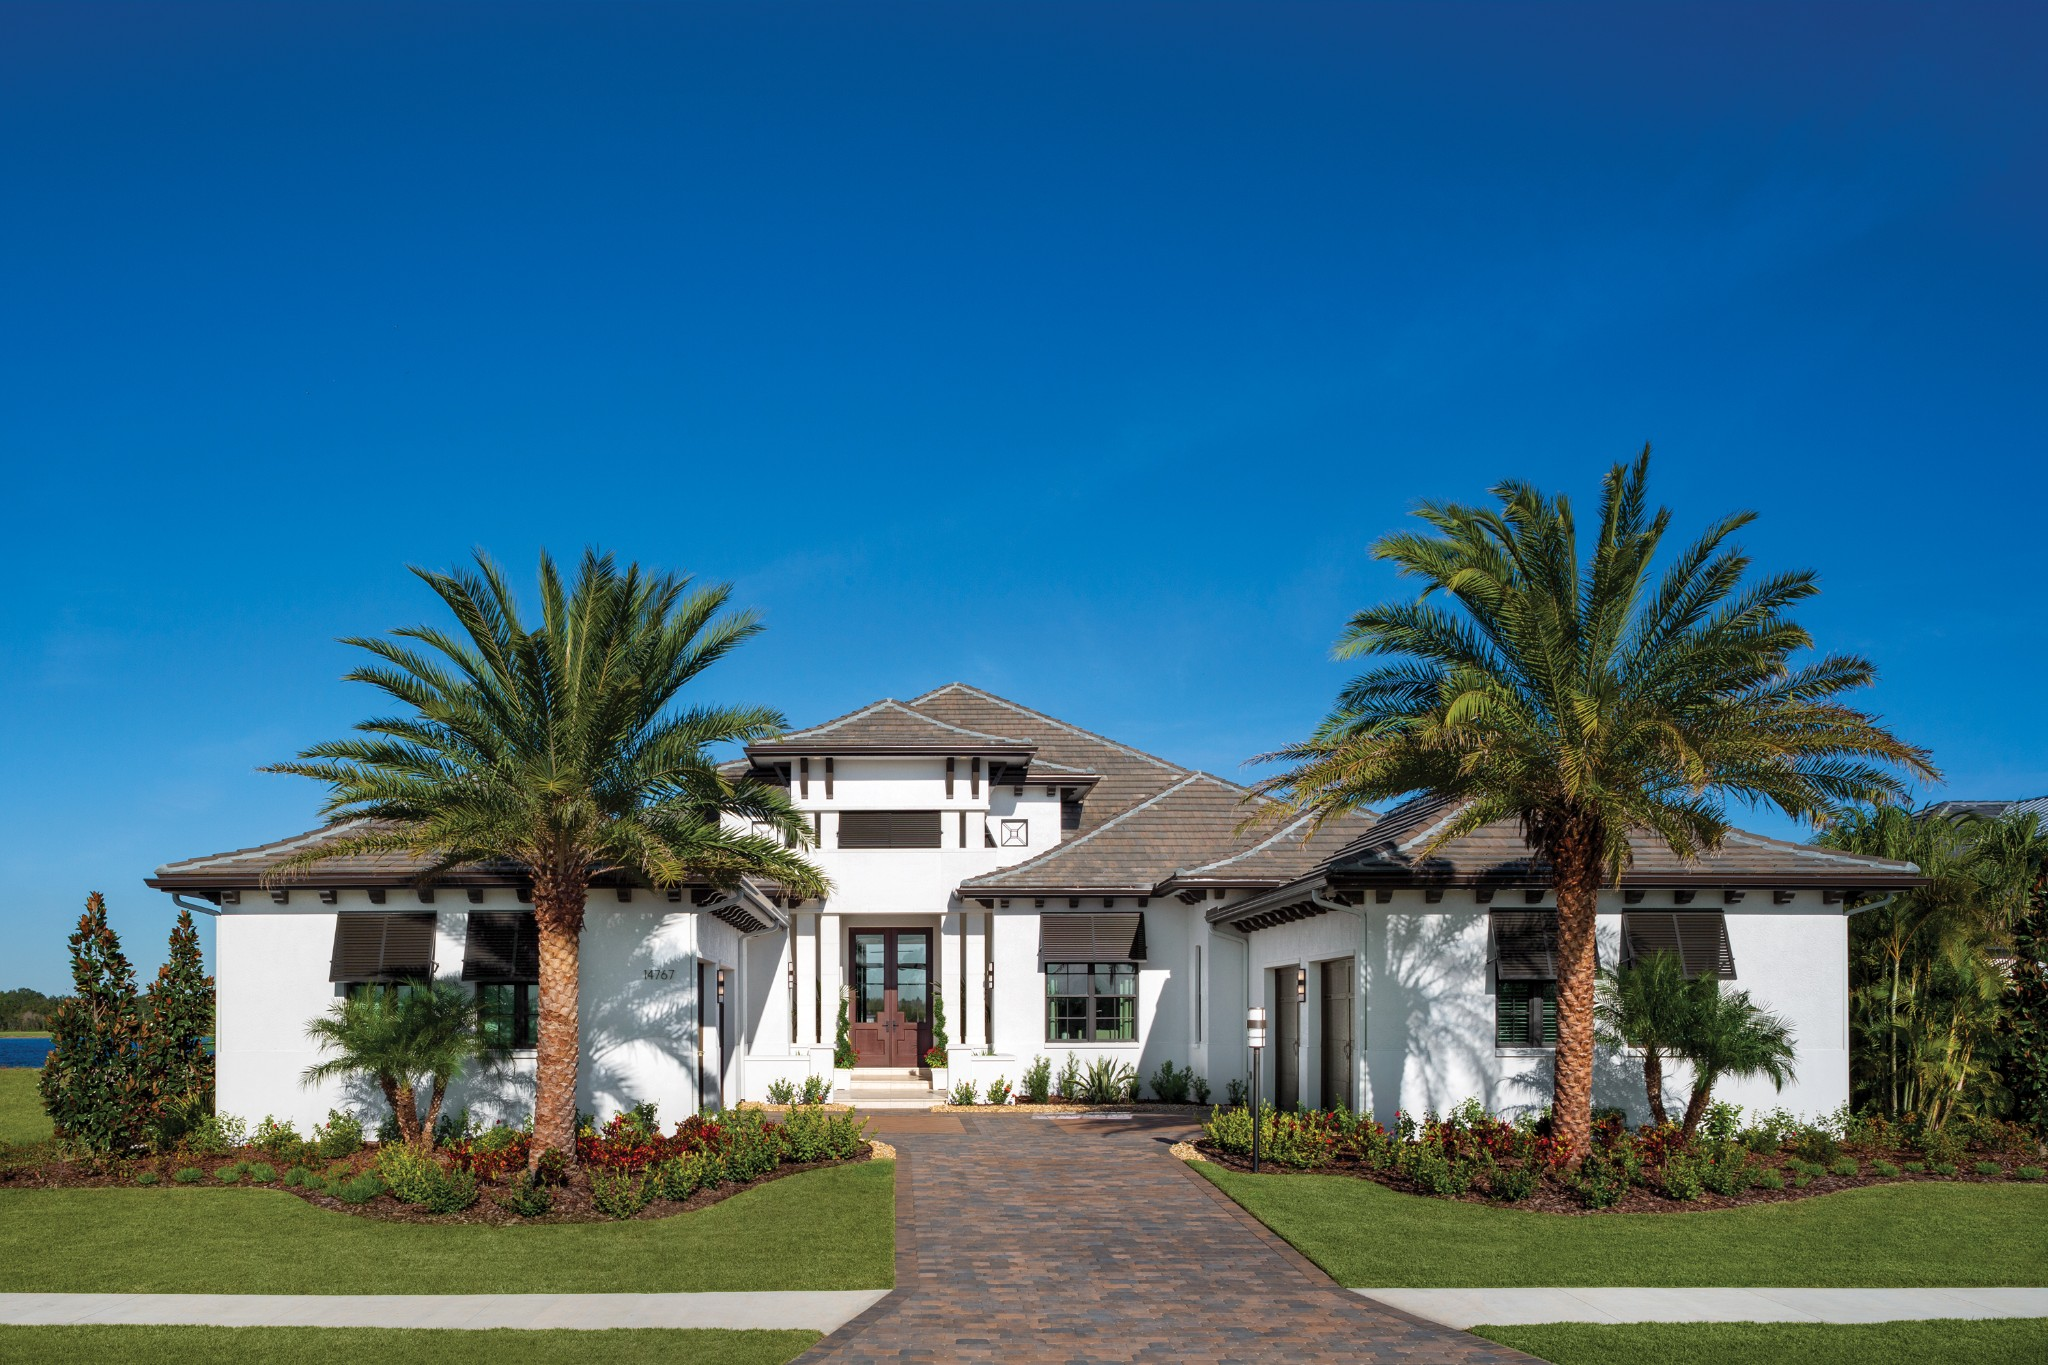 1230 Plantation Blvd, Gallatin, TN 37066 - Gallatin, TN real estate listing